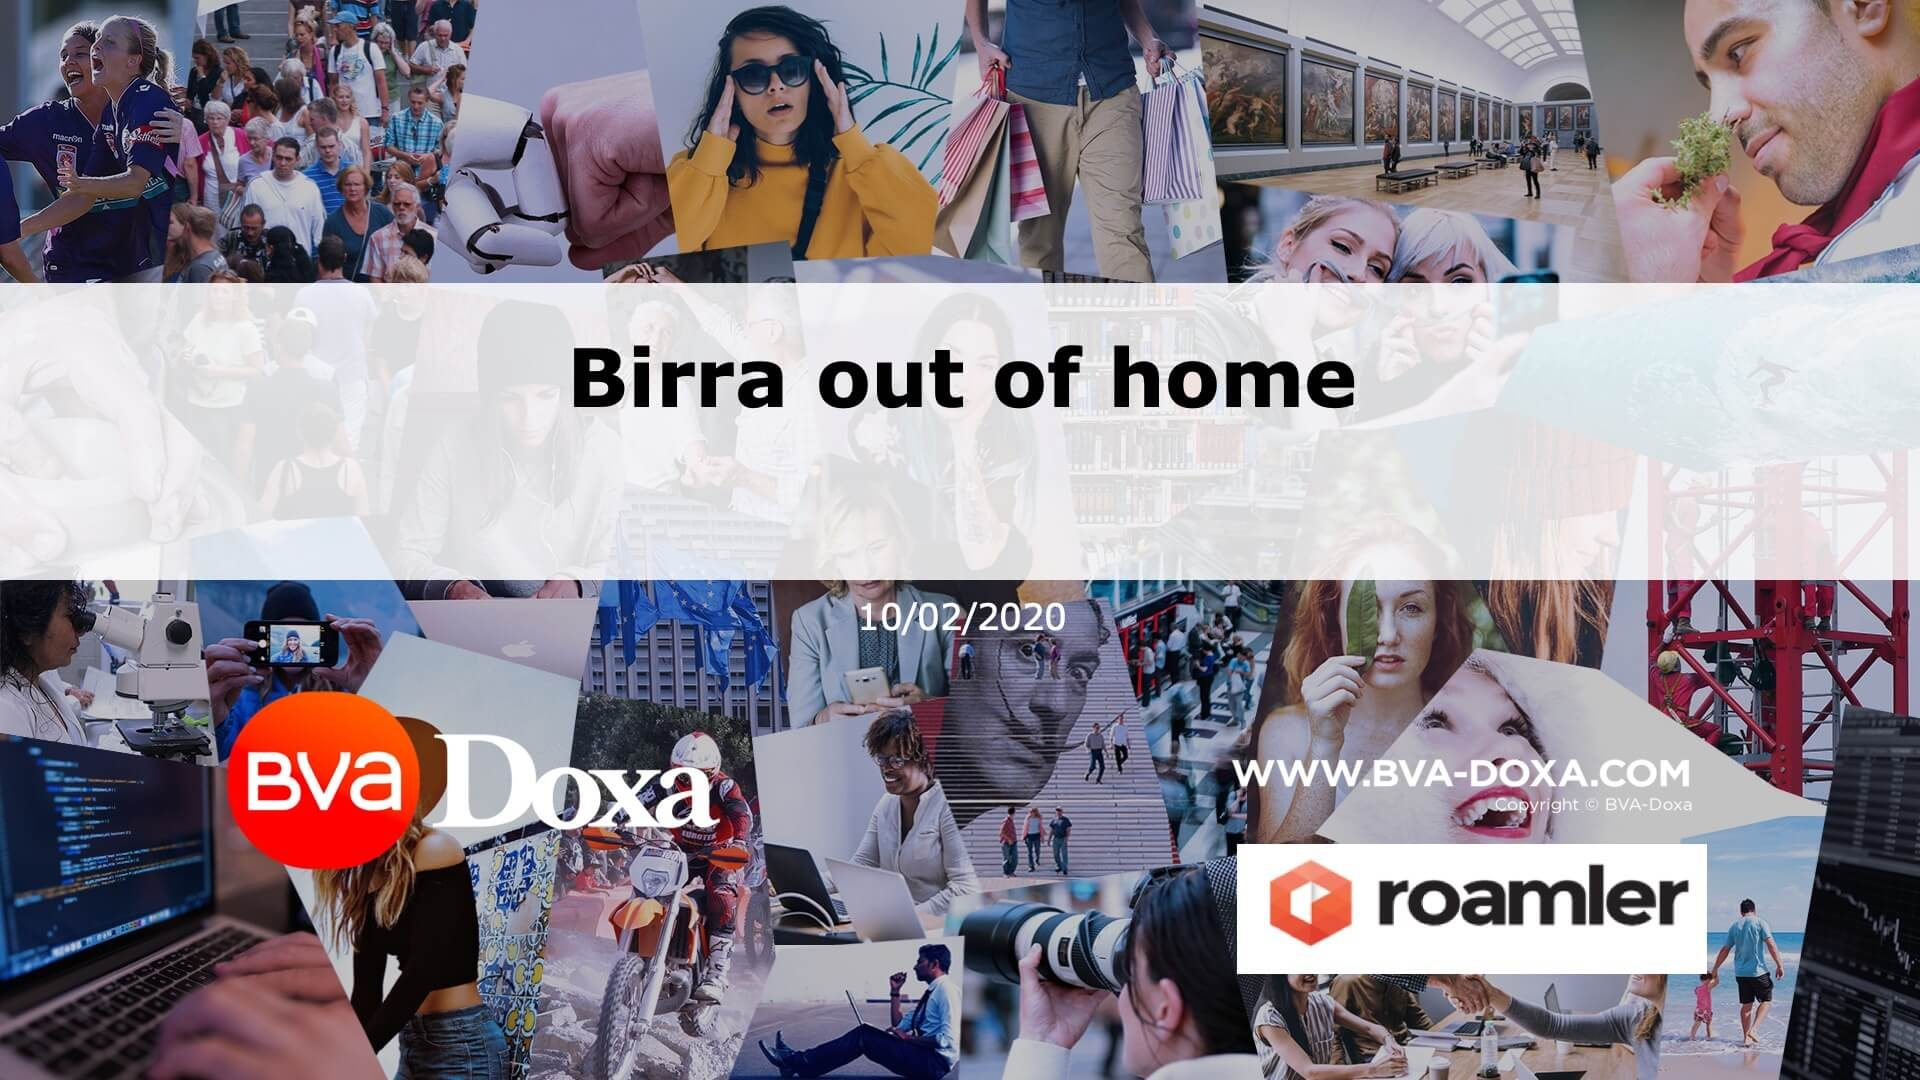 Bva Doxa Report Birra 01